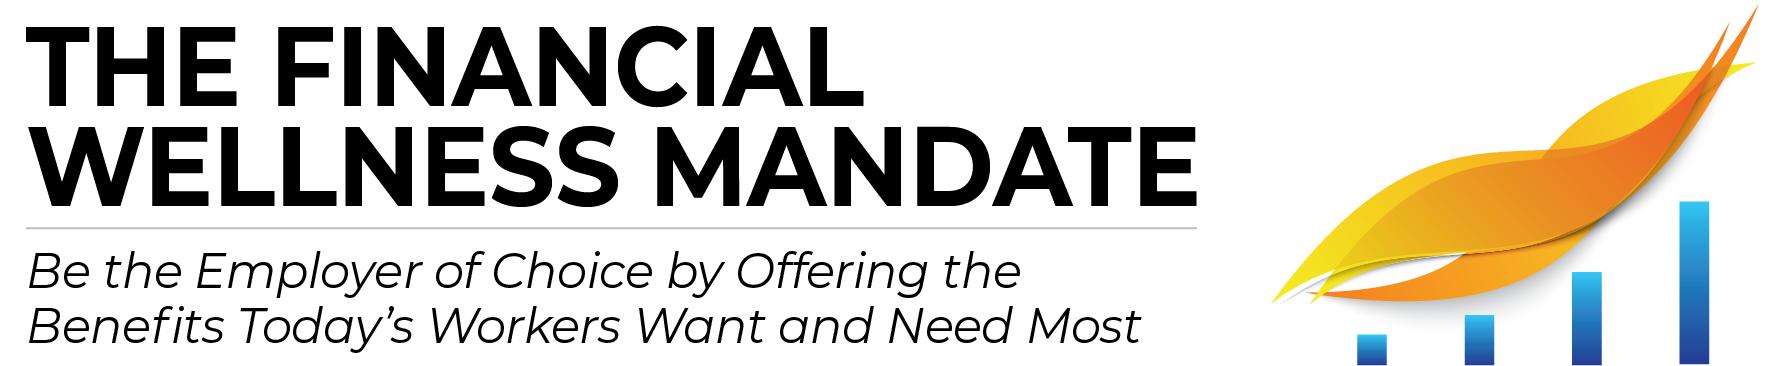 The Financial Wellness Mandate